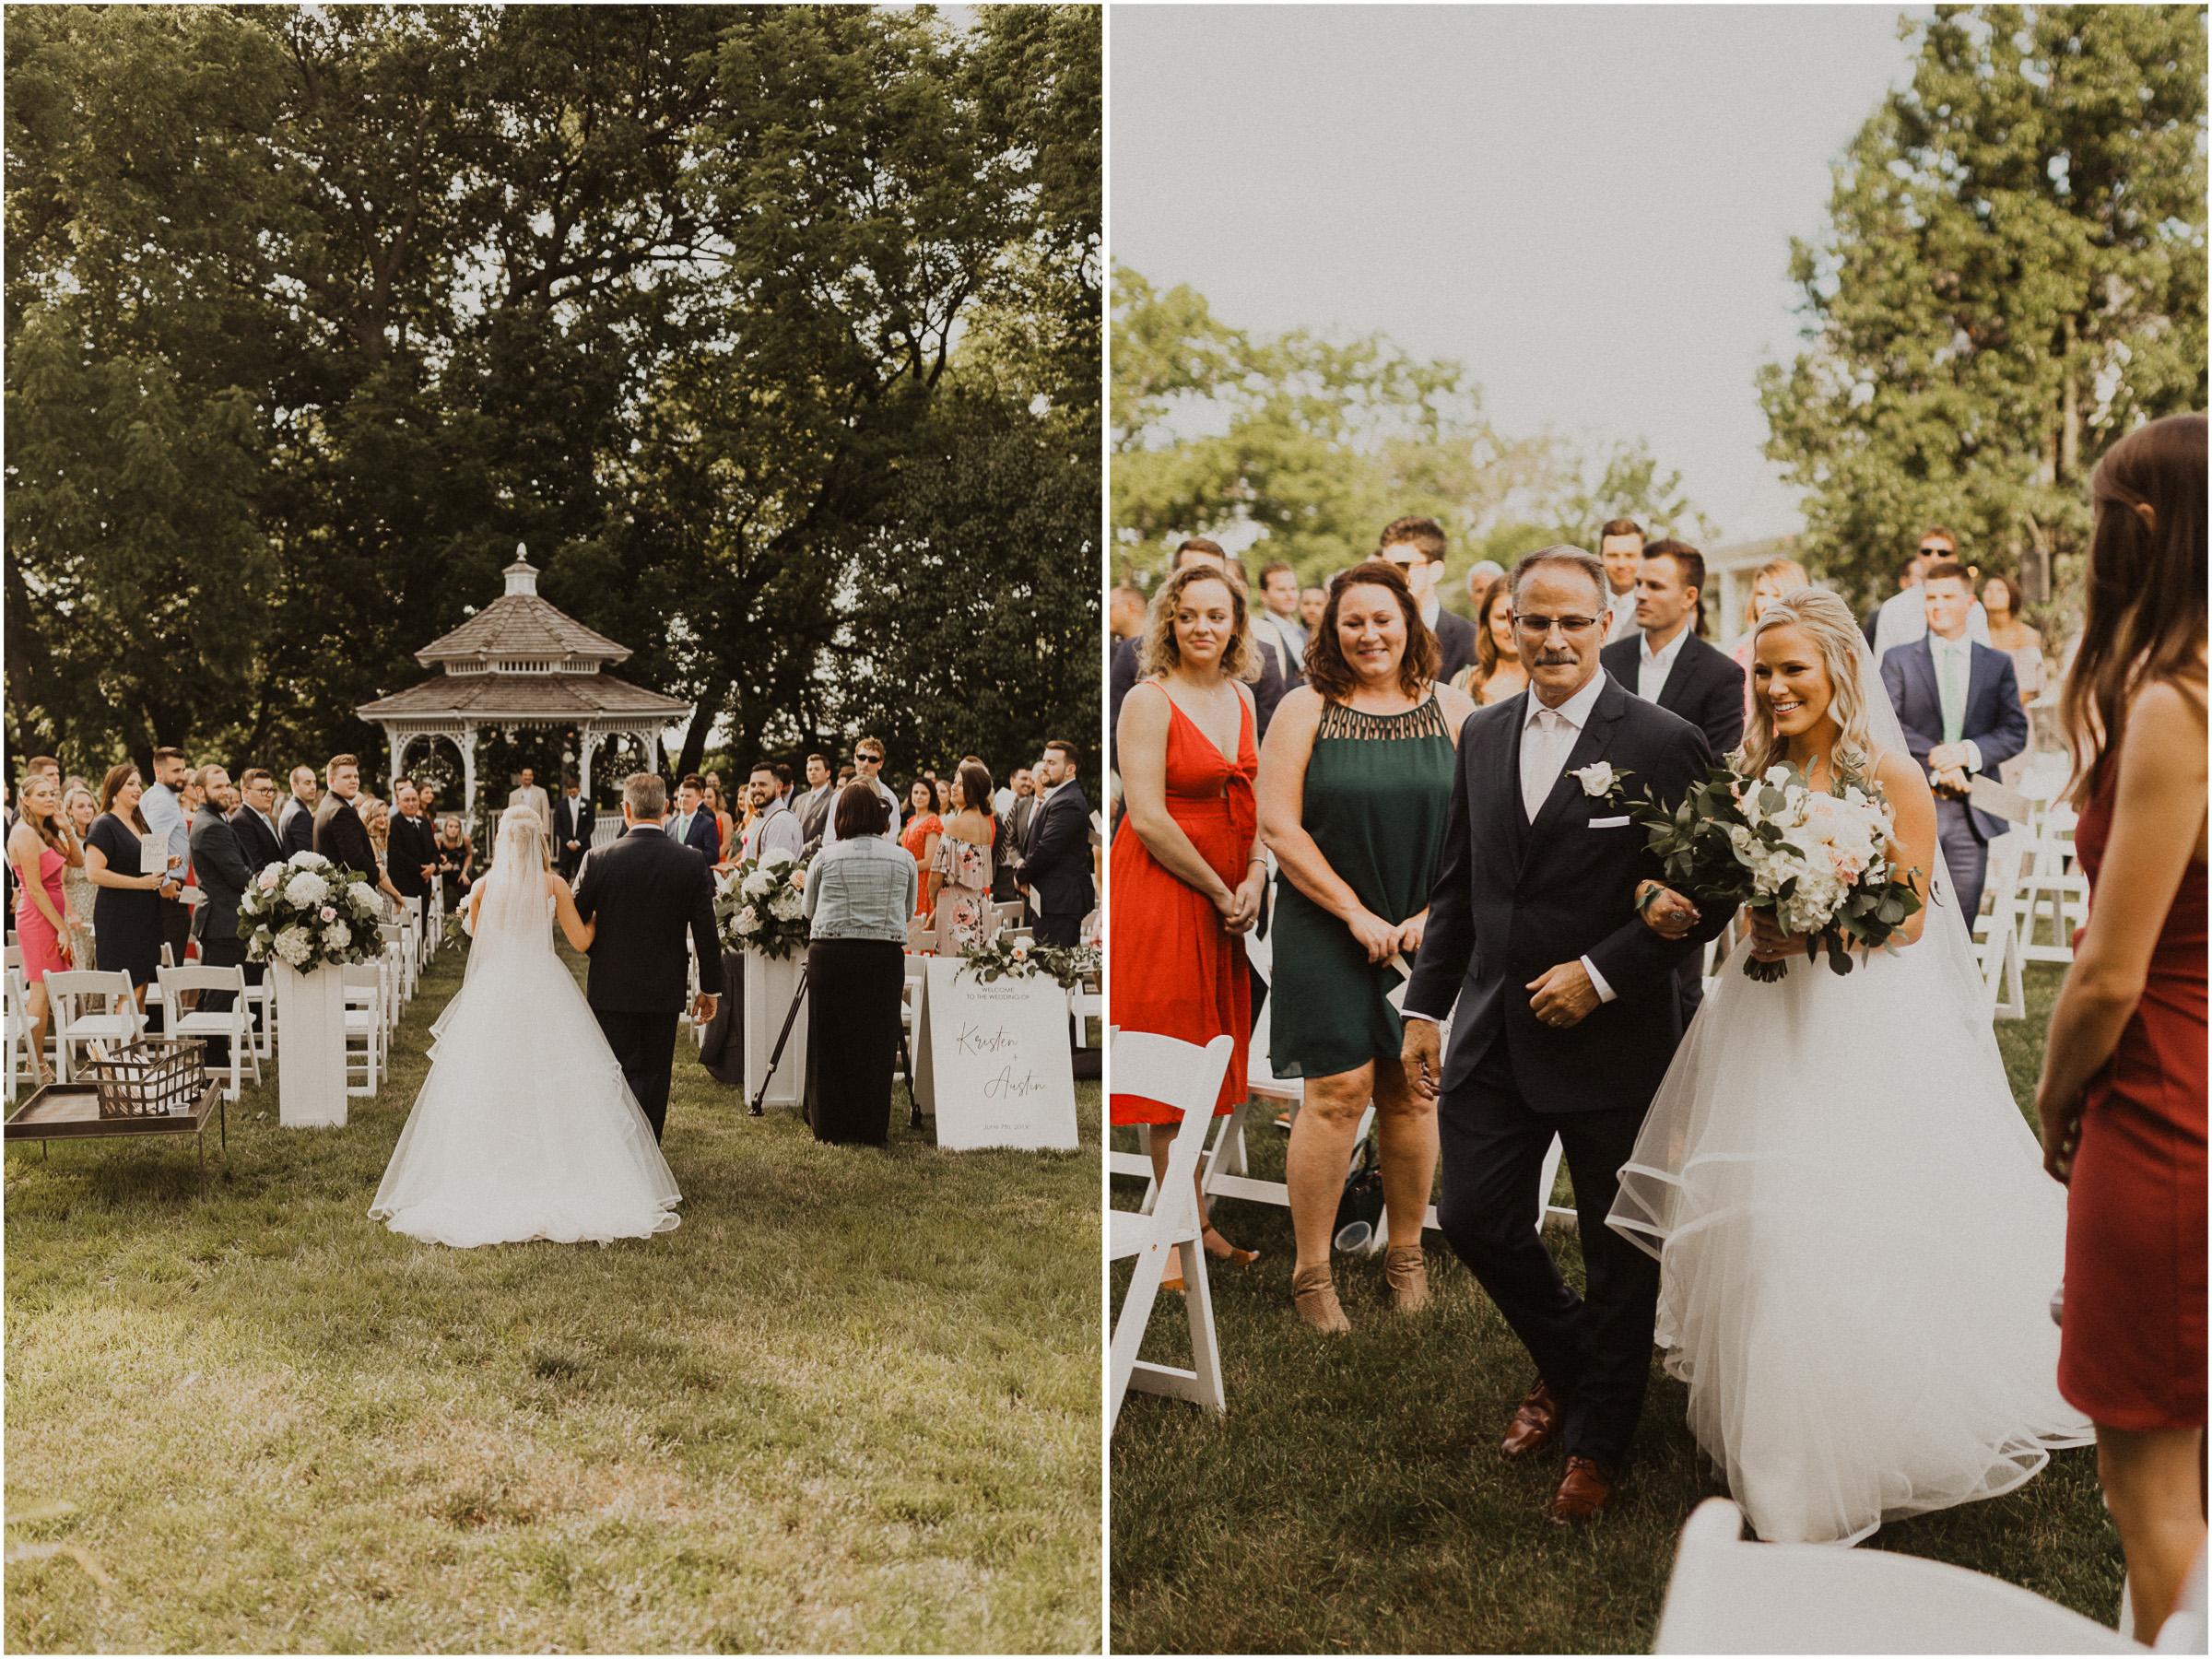 alyssa barletter photography hawthorne house summer outdoor wedding southern charm inspiration-43.jpg